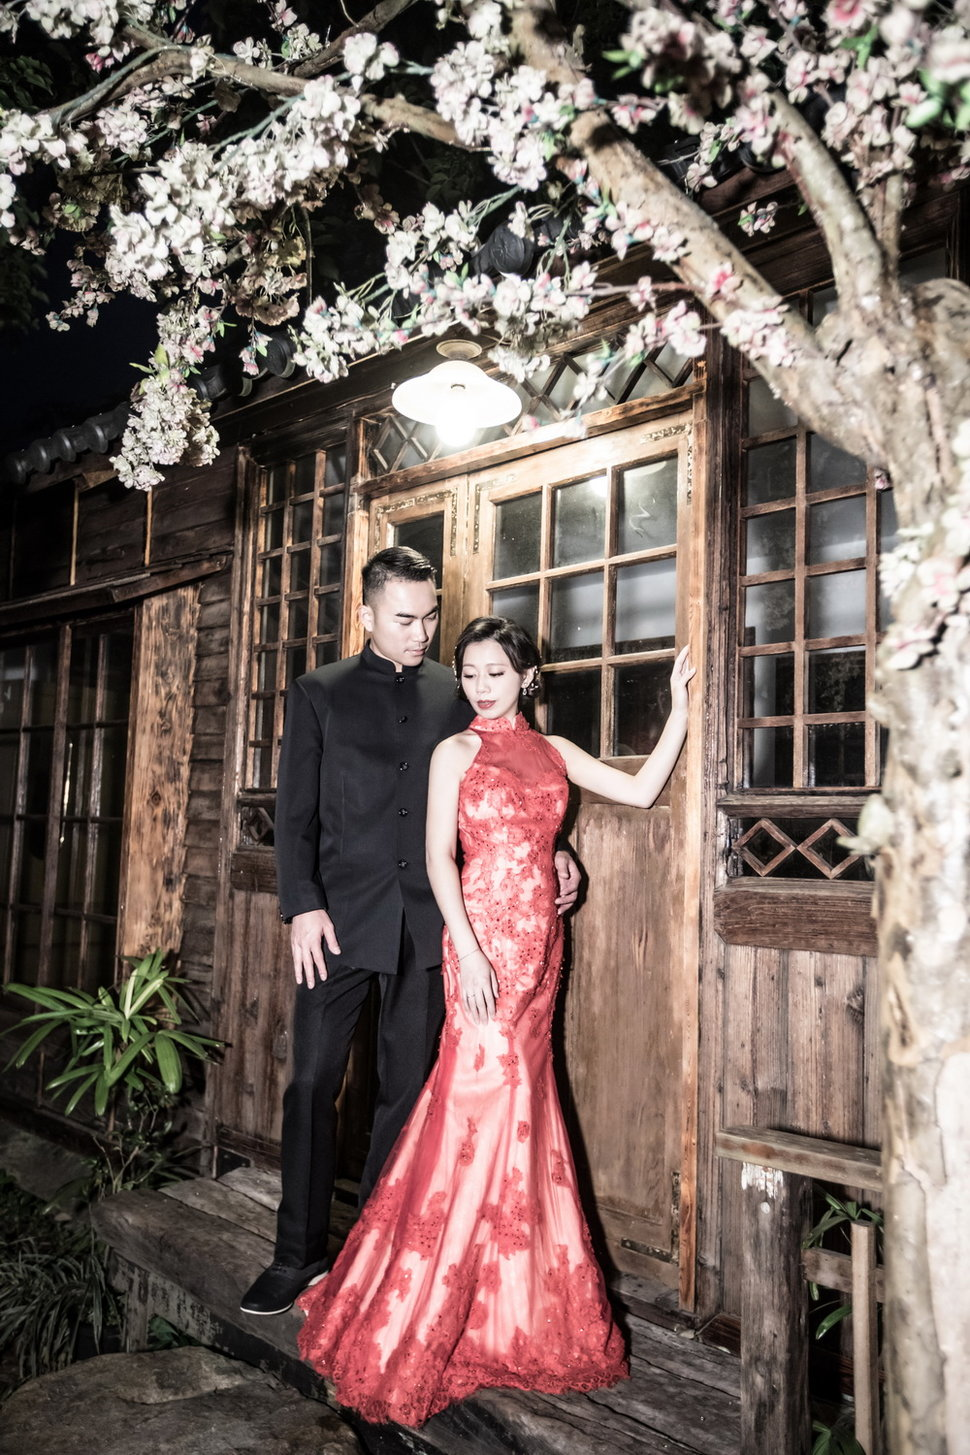 IMG_8952-1 - 春之嫁衣精緻婚紗 - 結婚吧